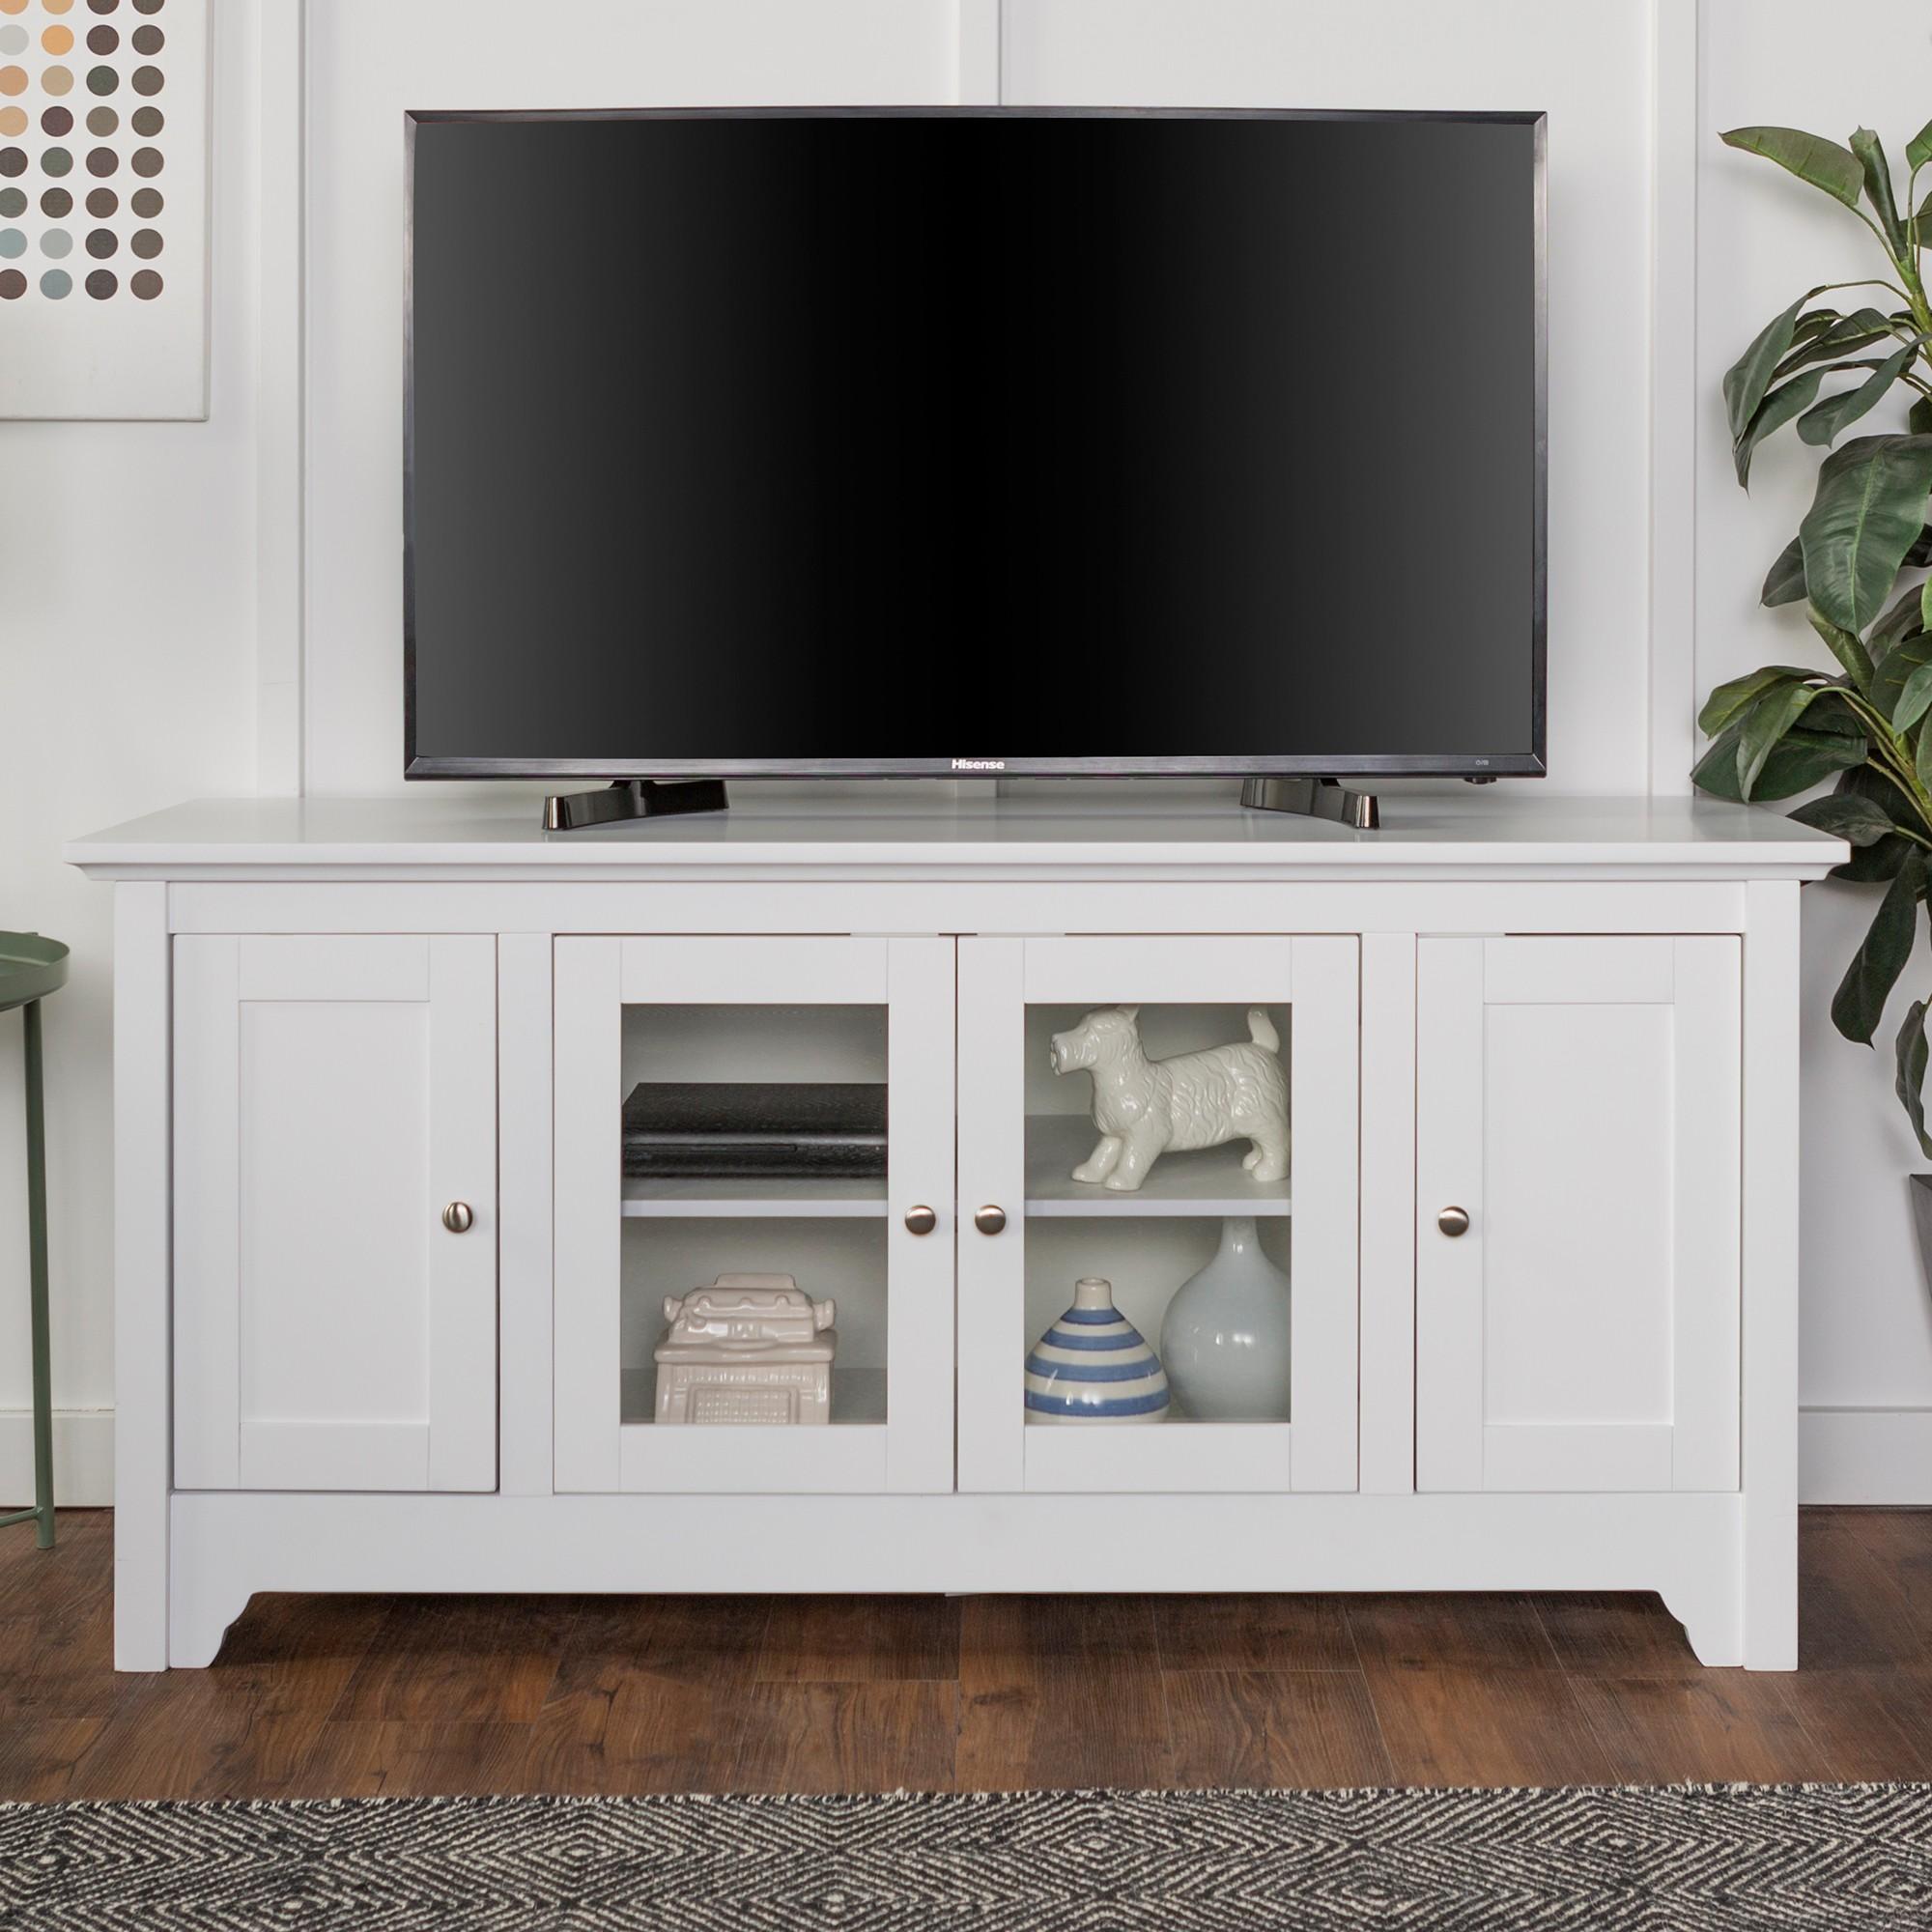 Enjoyable 52 Wood Tv Media Stand Storage Console White Saracina Evergreenethics Interior Chair Design Evergreenethicsorg